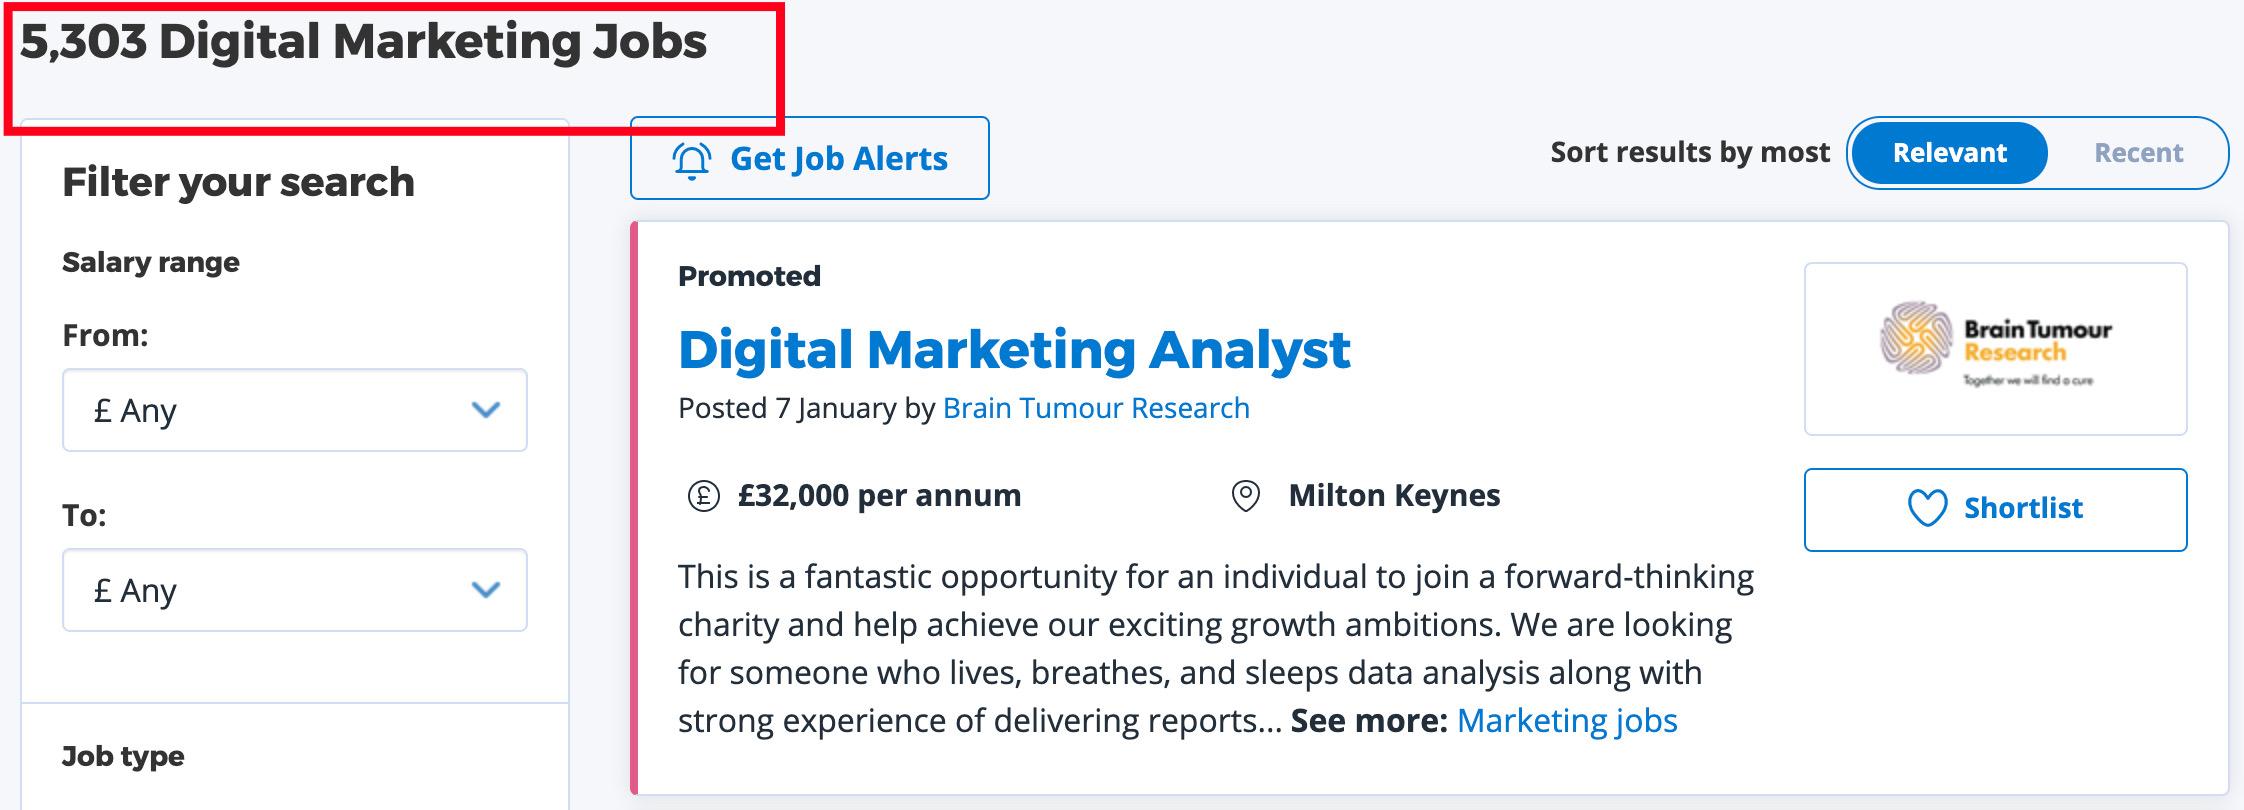 Digital Marketing Jobs in UK